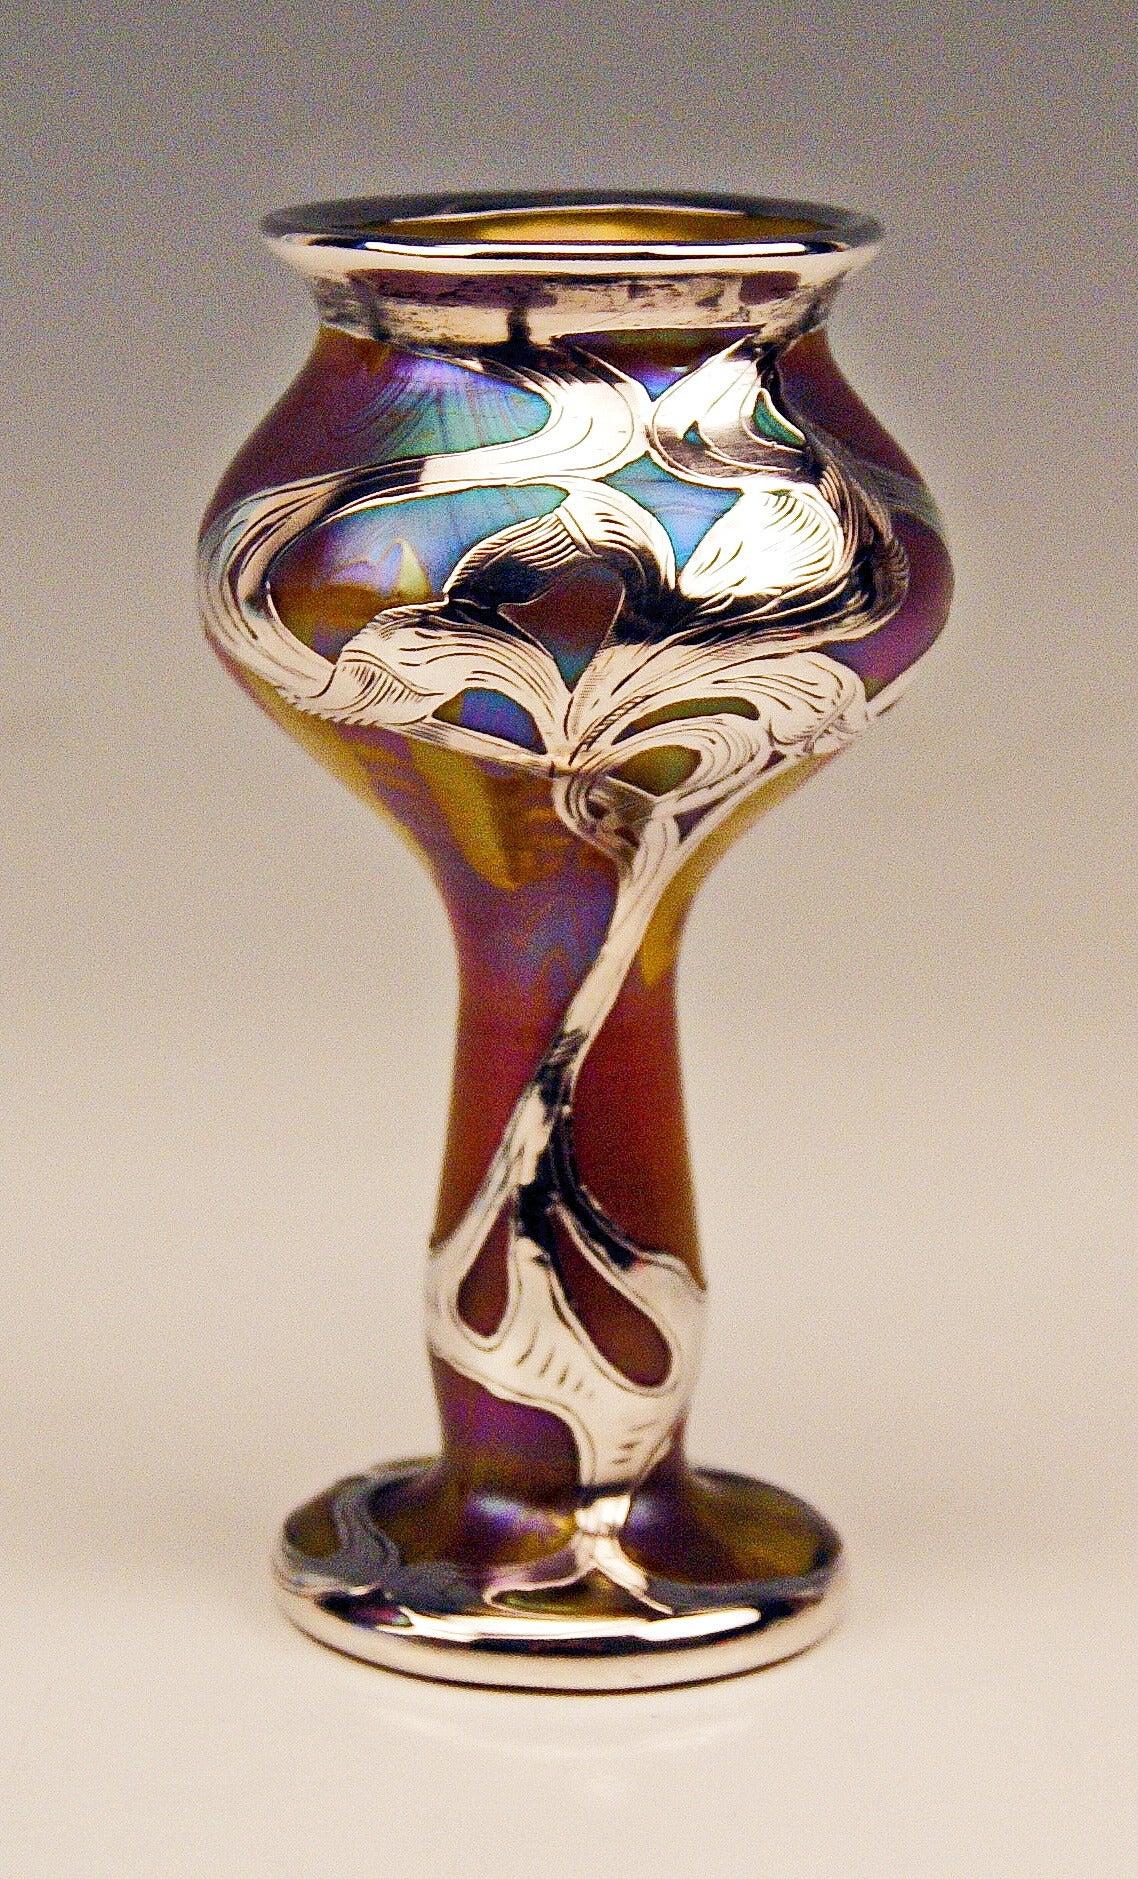 Austrian Vase Loetz Widow Art Nouveau Phaenomen Gre Silver Overlay, circa 1900 For Sale